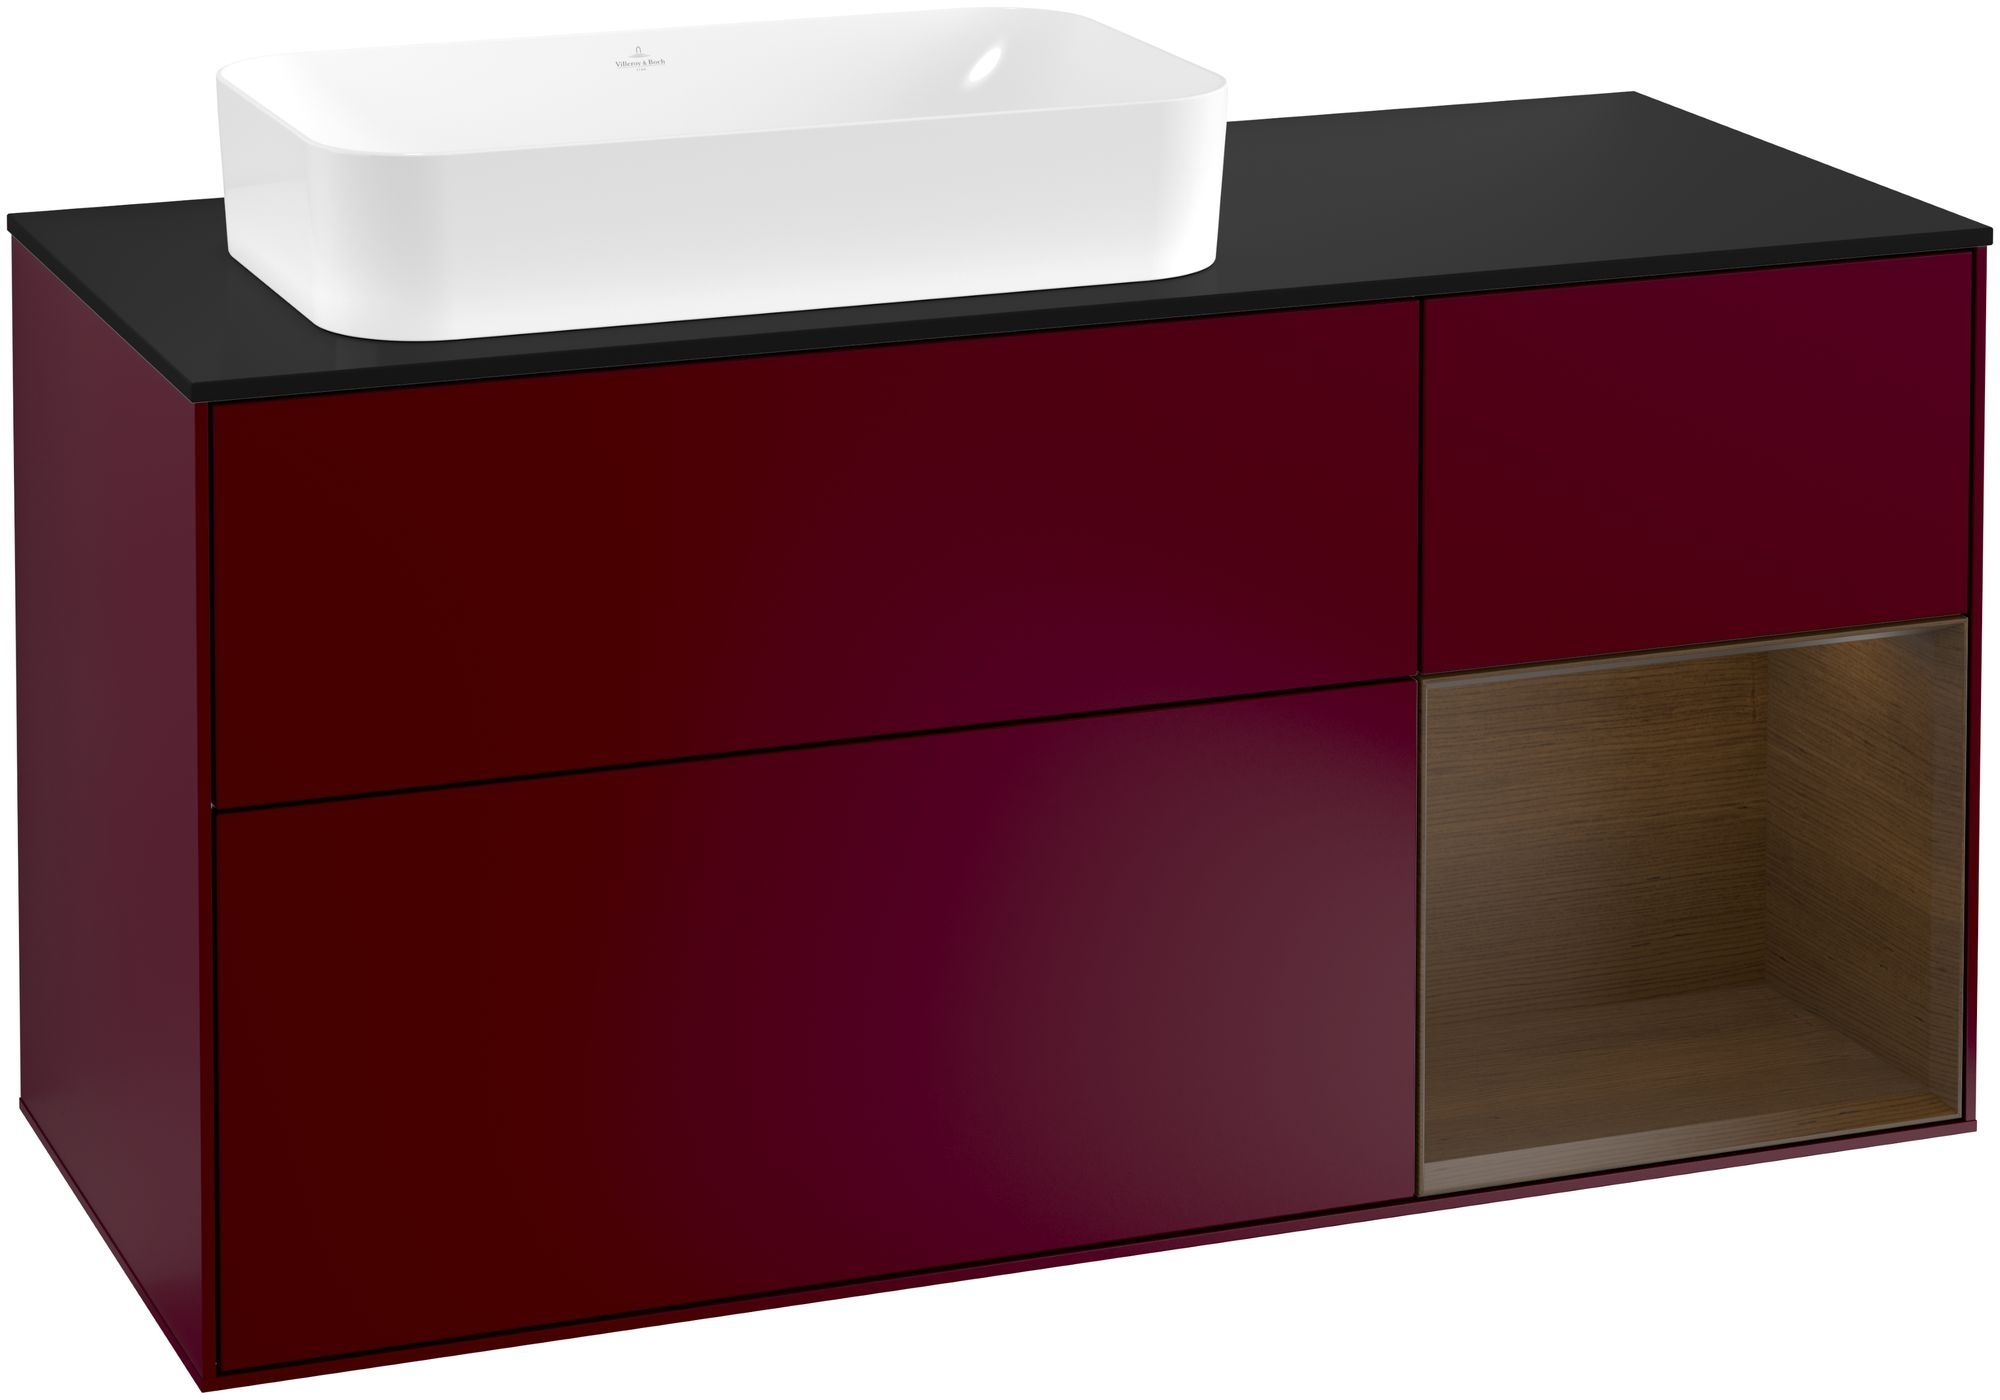 Villeroy & Boch Finion G28 Waschtischunterschrank mit Regalelement 3 Auszüge Waschtisch links LED-Beleuchtung B:120xH:60,3xT:50,1cm Front, Korpus: Peony, Regal: Walnut Veneer, Glasplatte: Black Matt G282GNHB